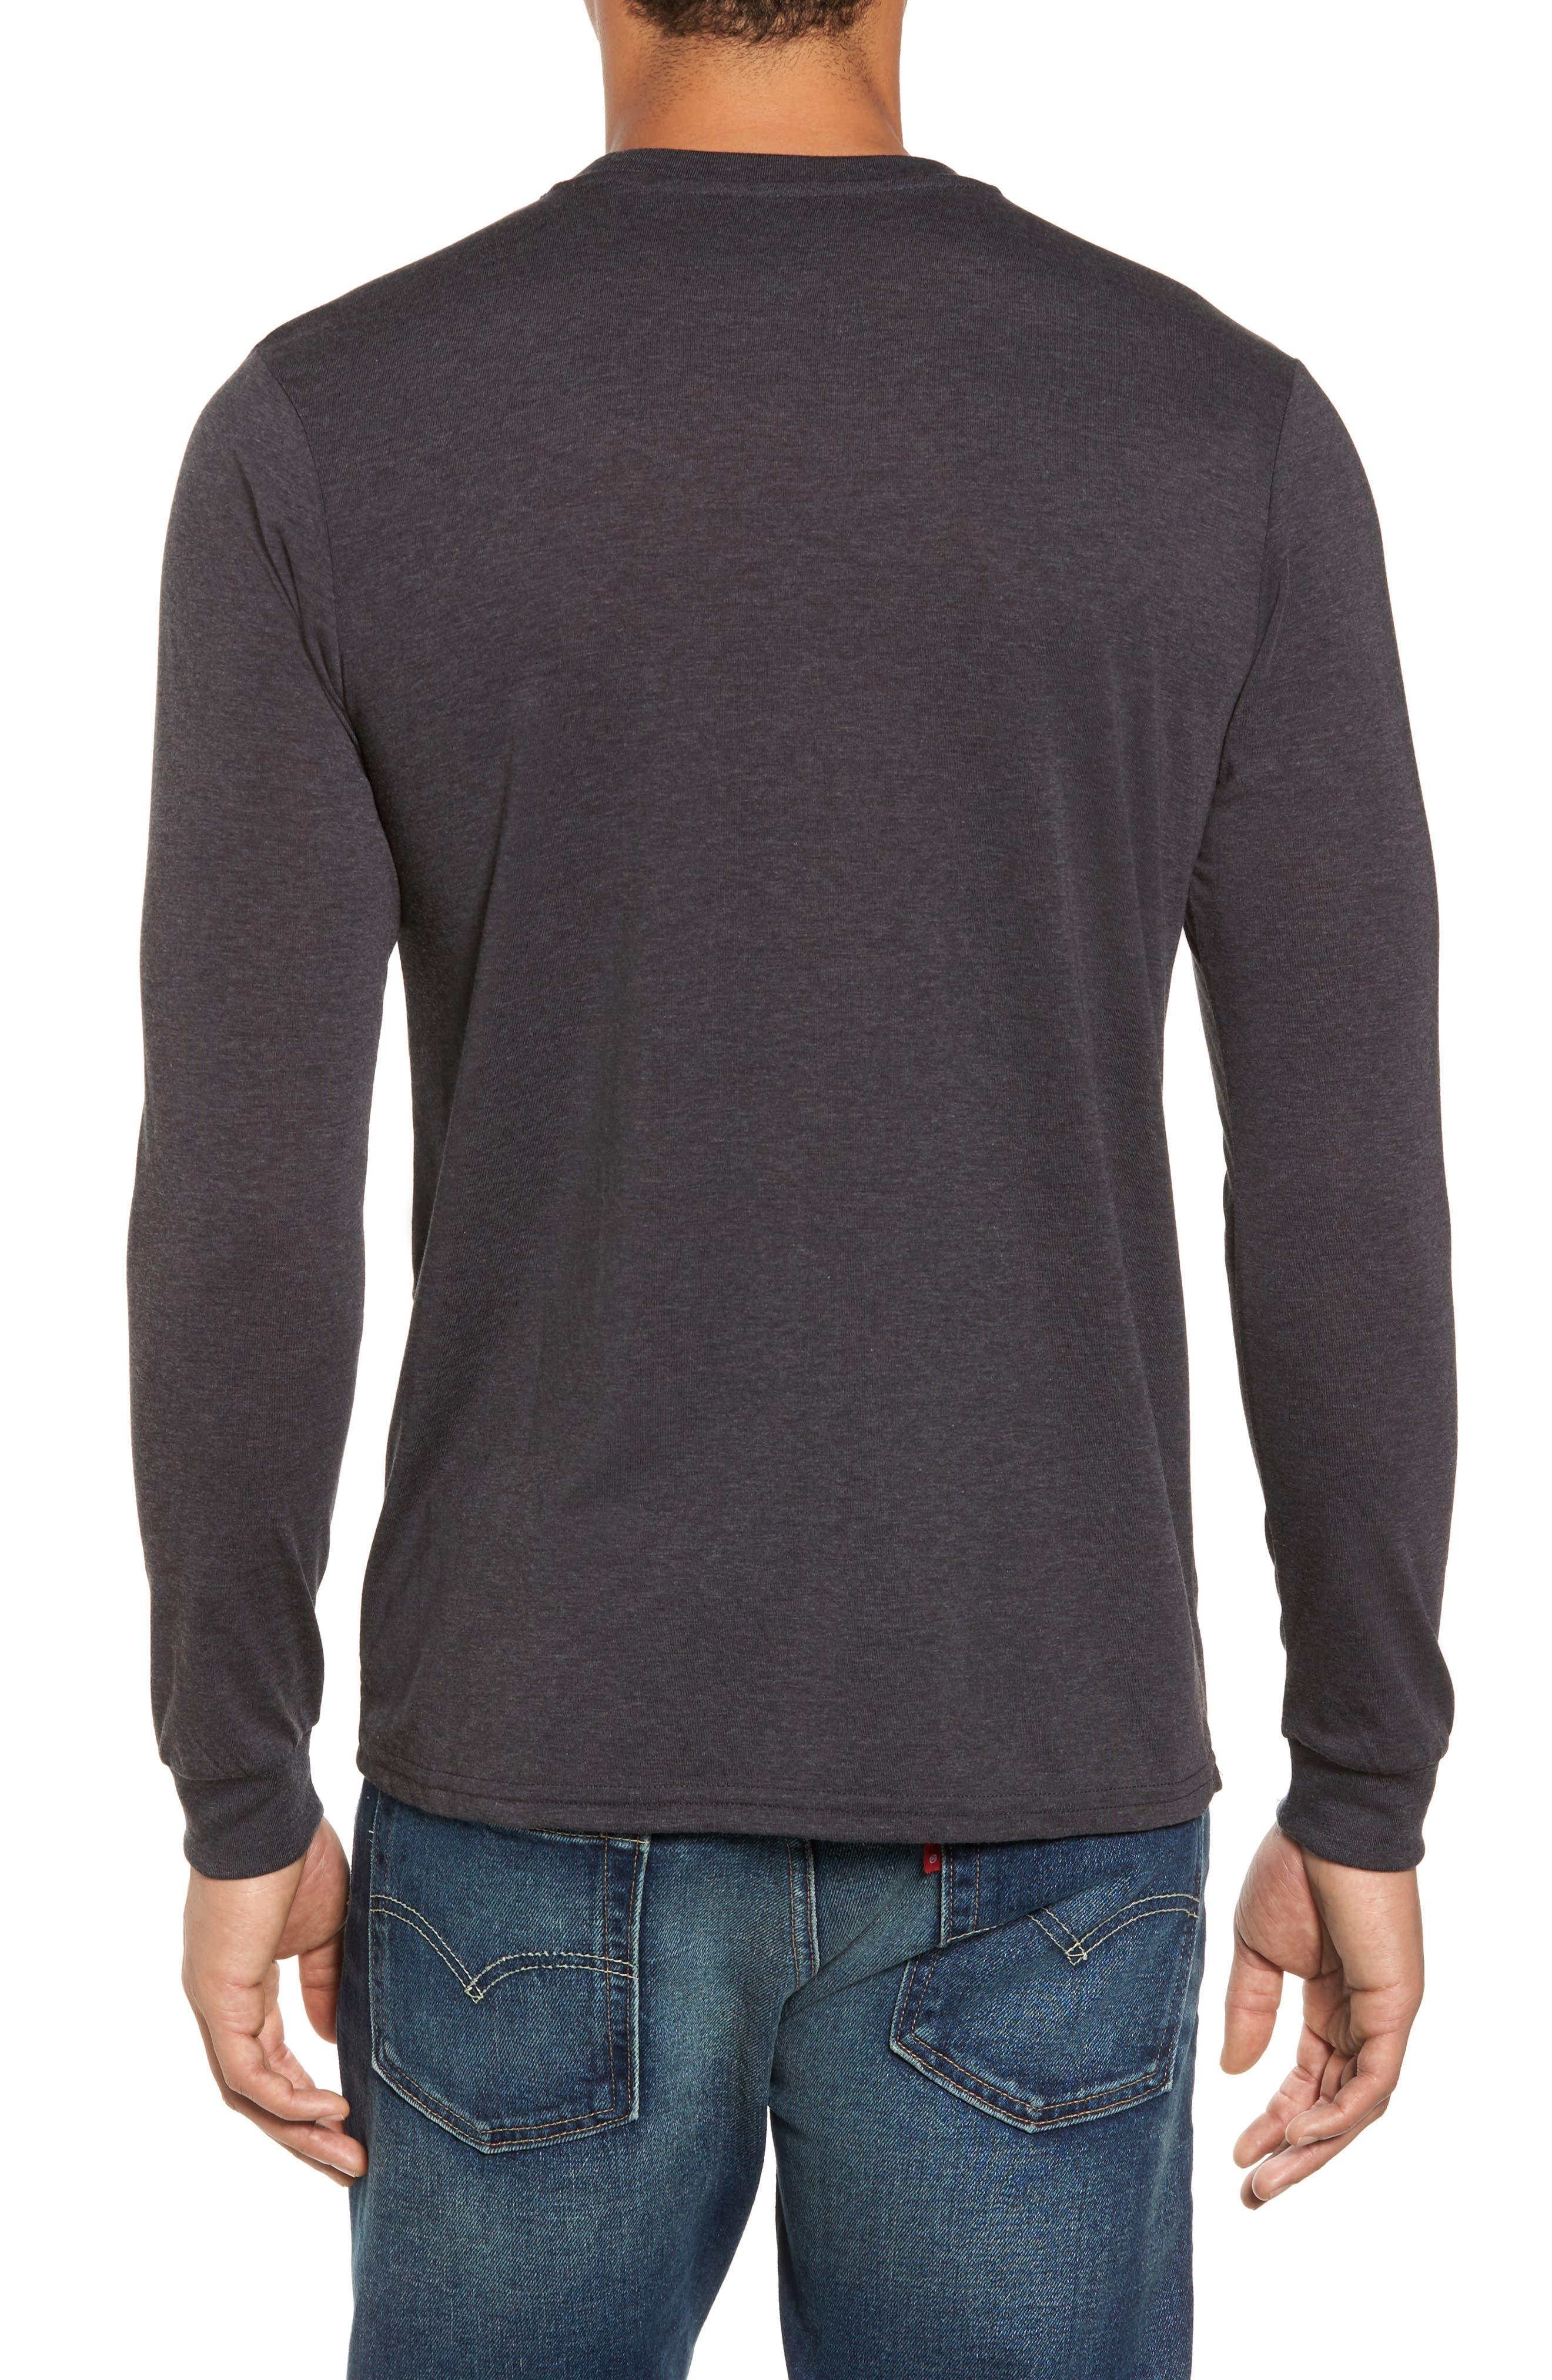 Mini Wettie Tech T-Shirt,                             Alternate thumbnail 2, color,                             Charcoal